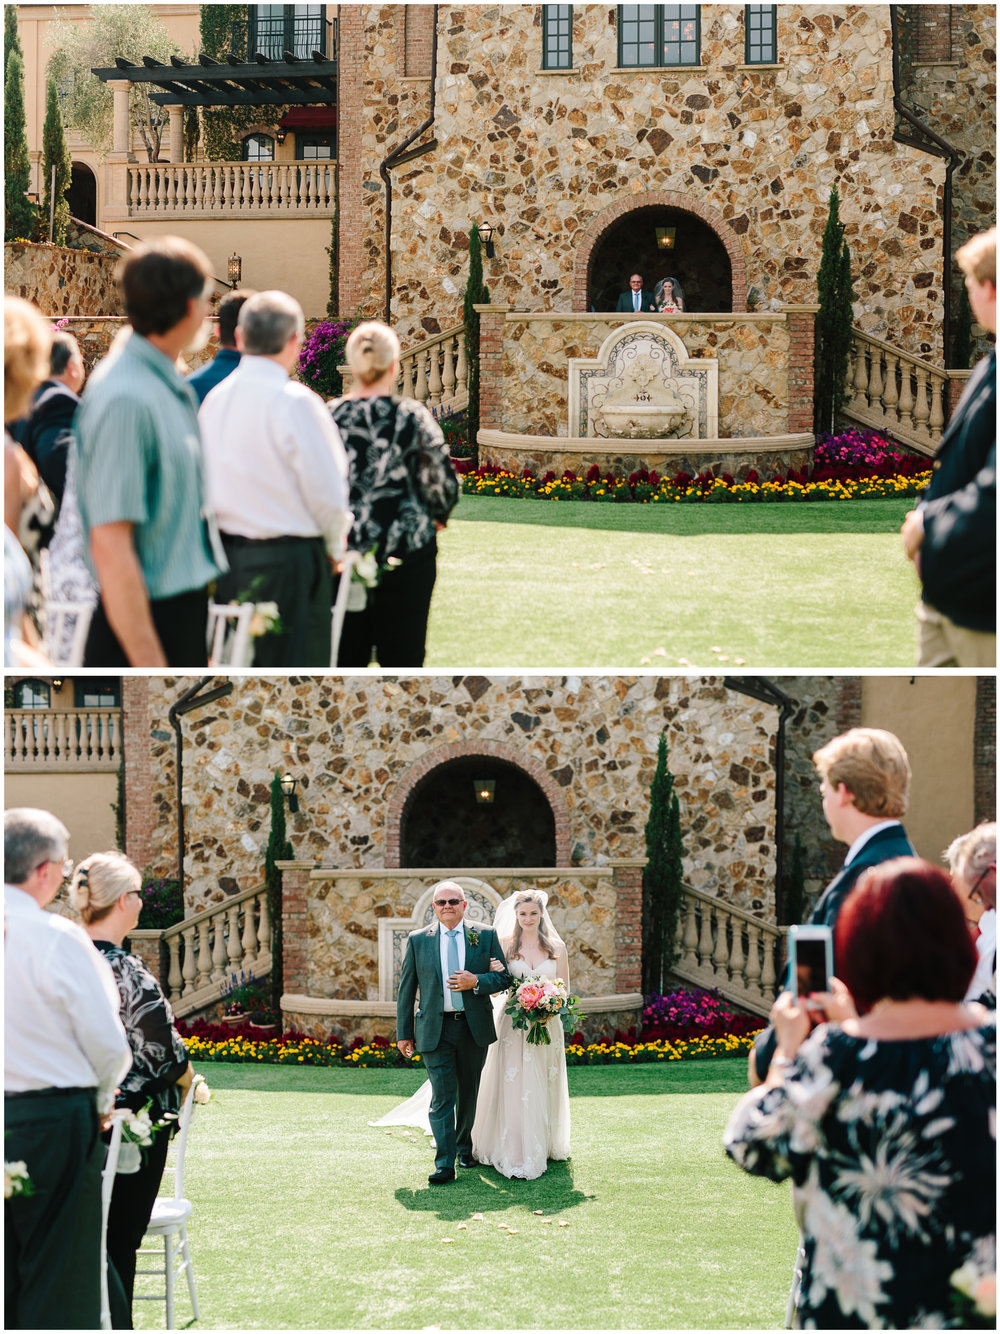 bella_collina_wedding_36.jpg